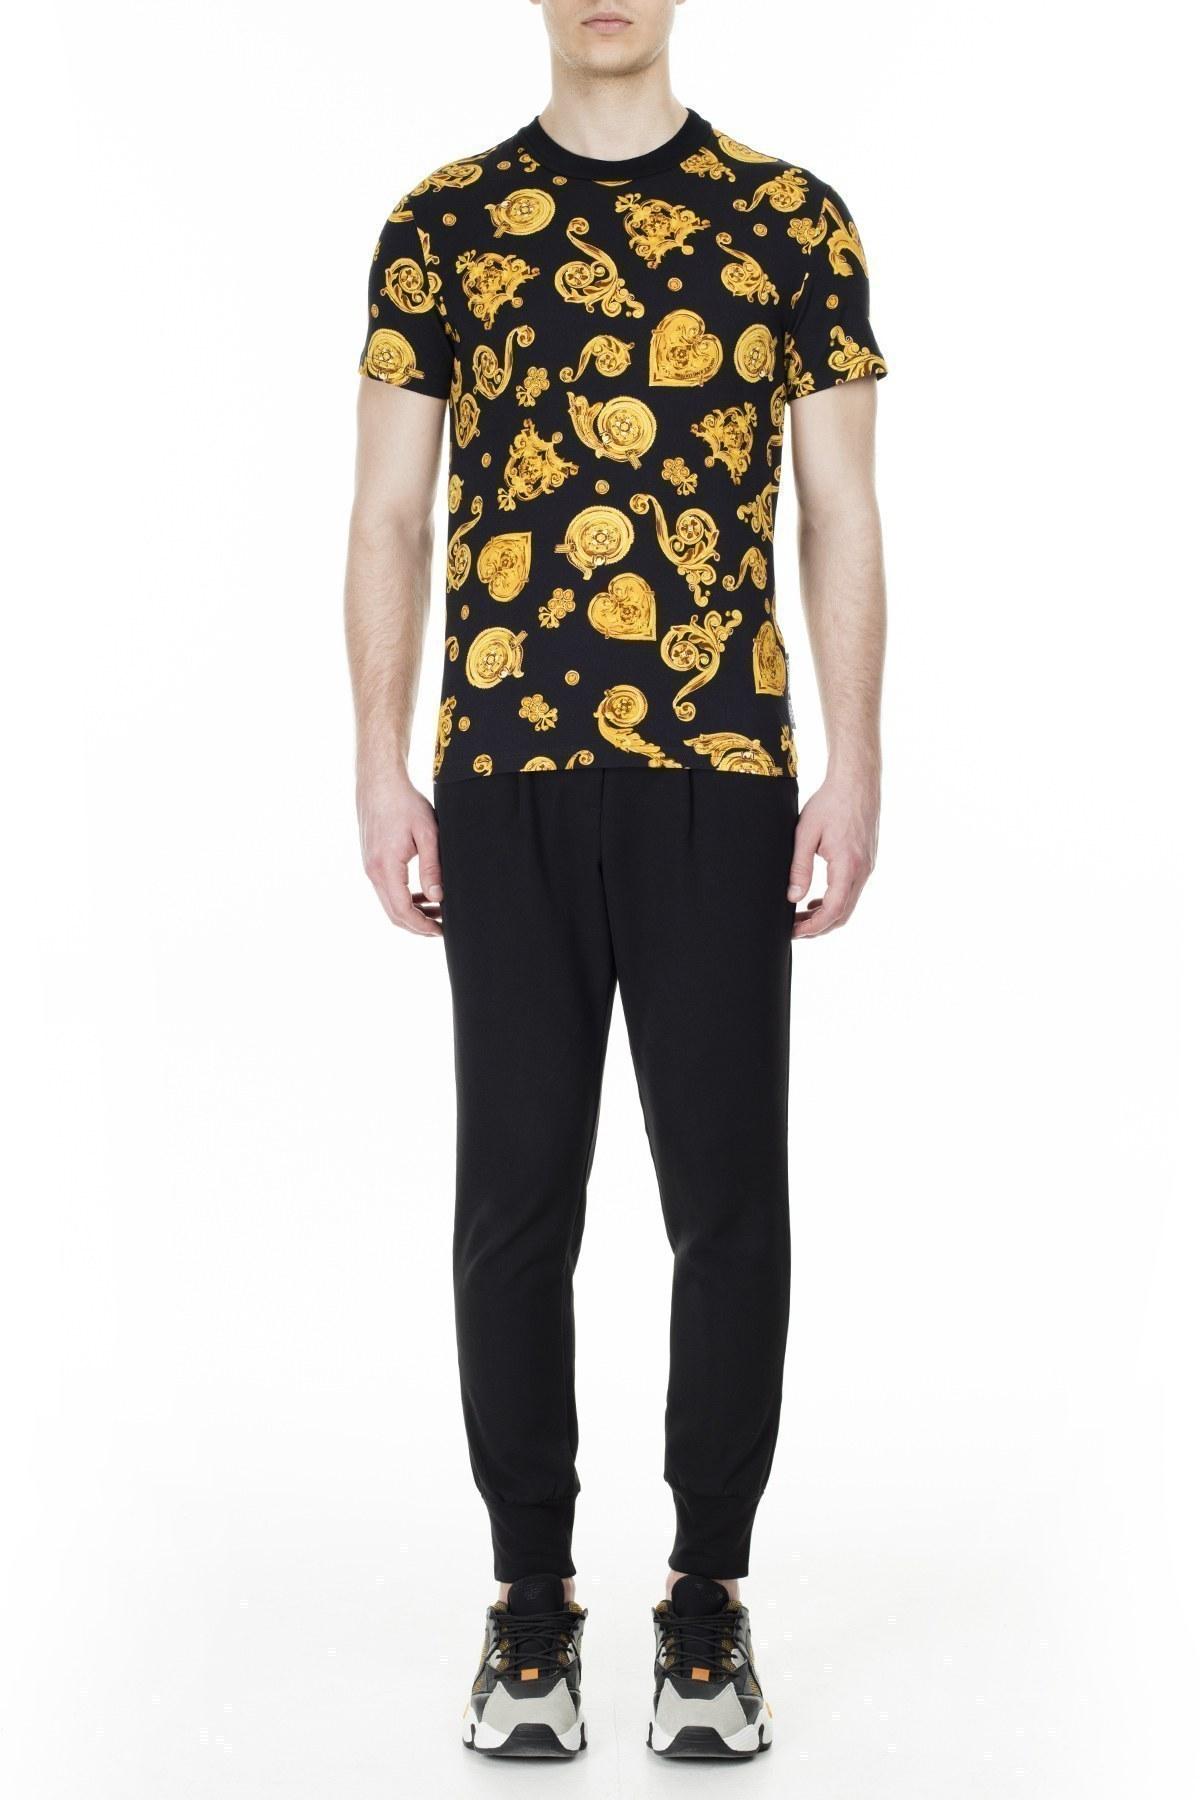 Versace Jeans Couture Erkek T Shirt B3GVB724 SN600 899 SİYAH